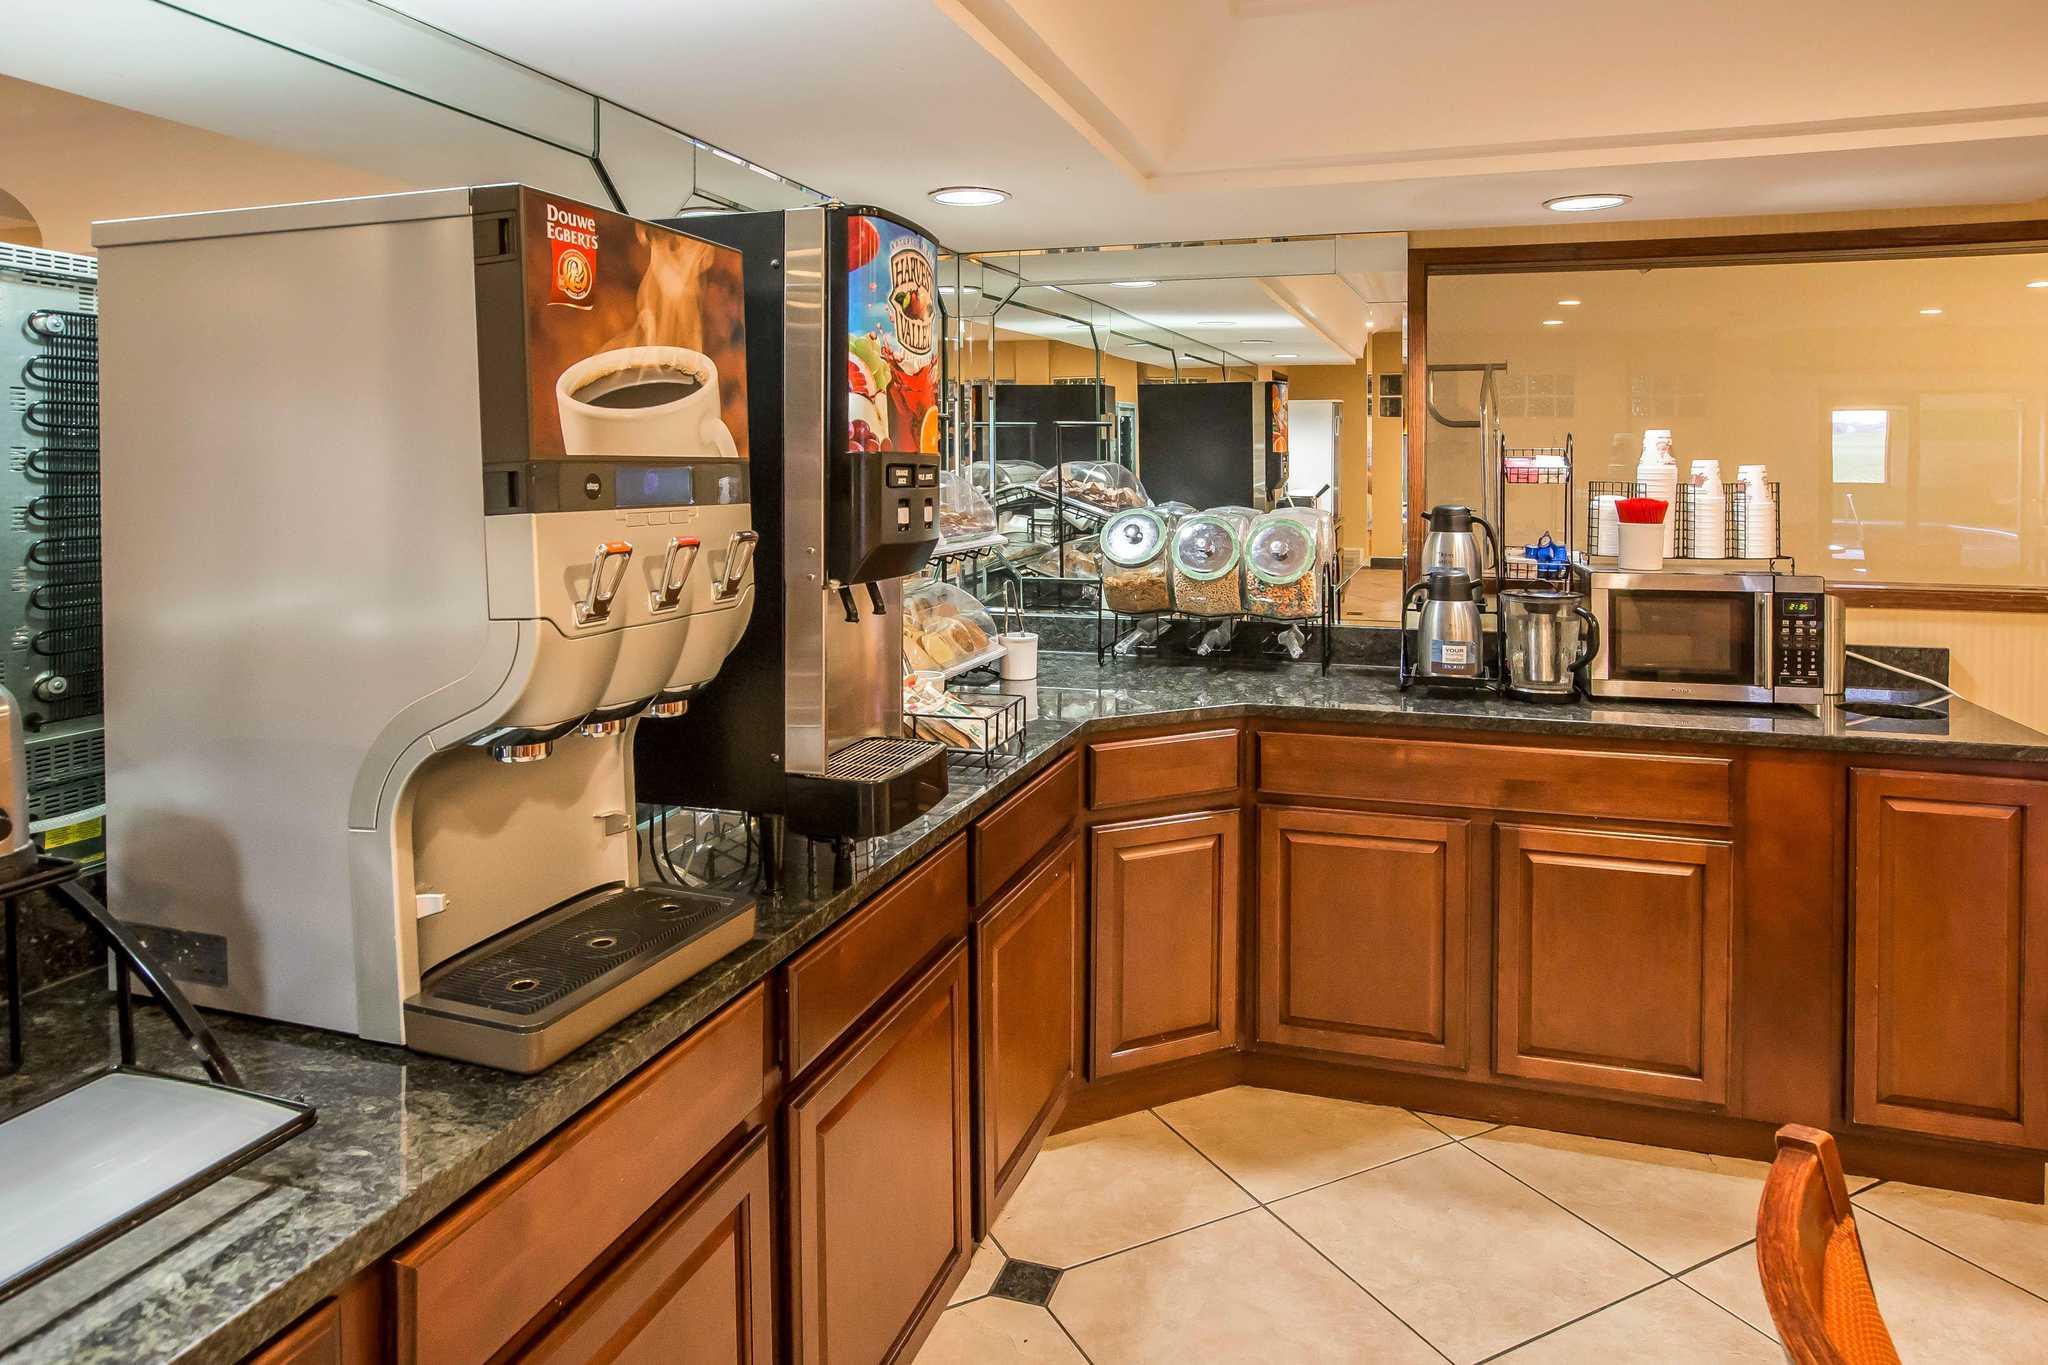 Econo Lodge Inn & Suites image 22